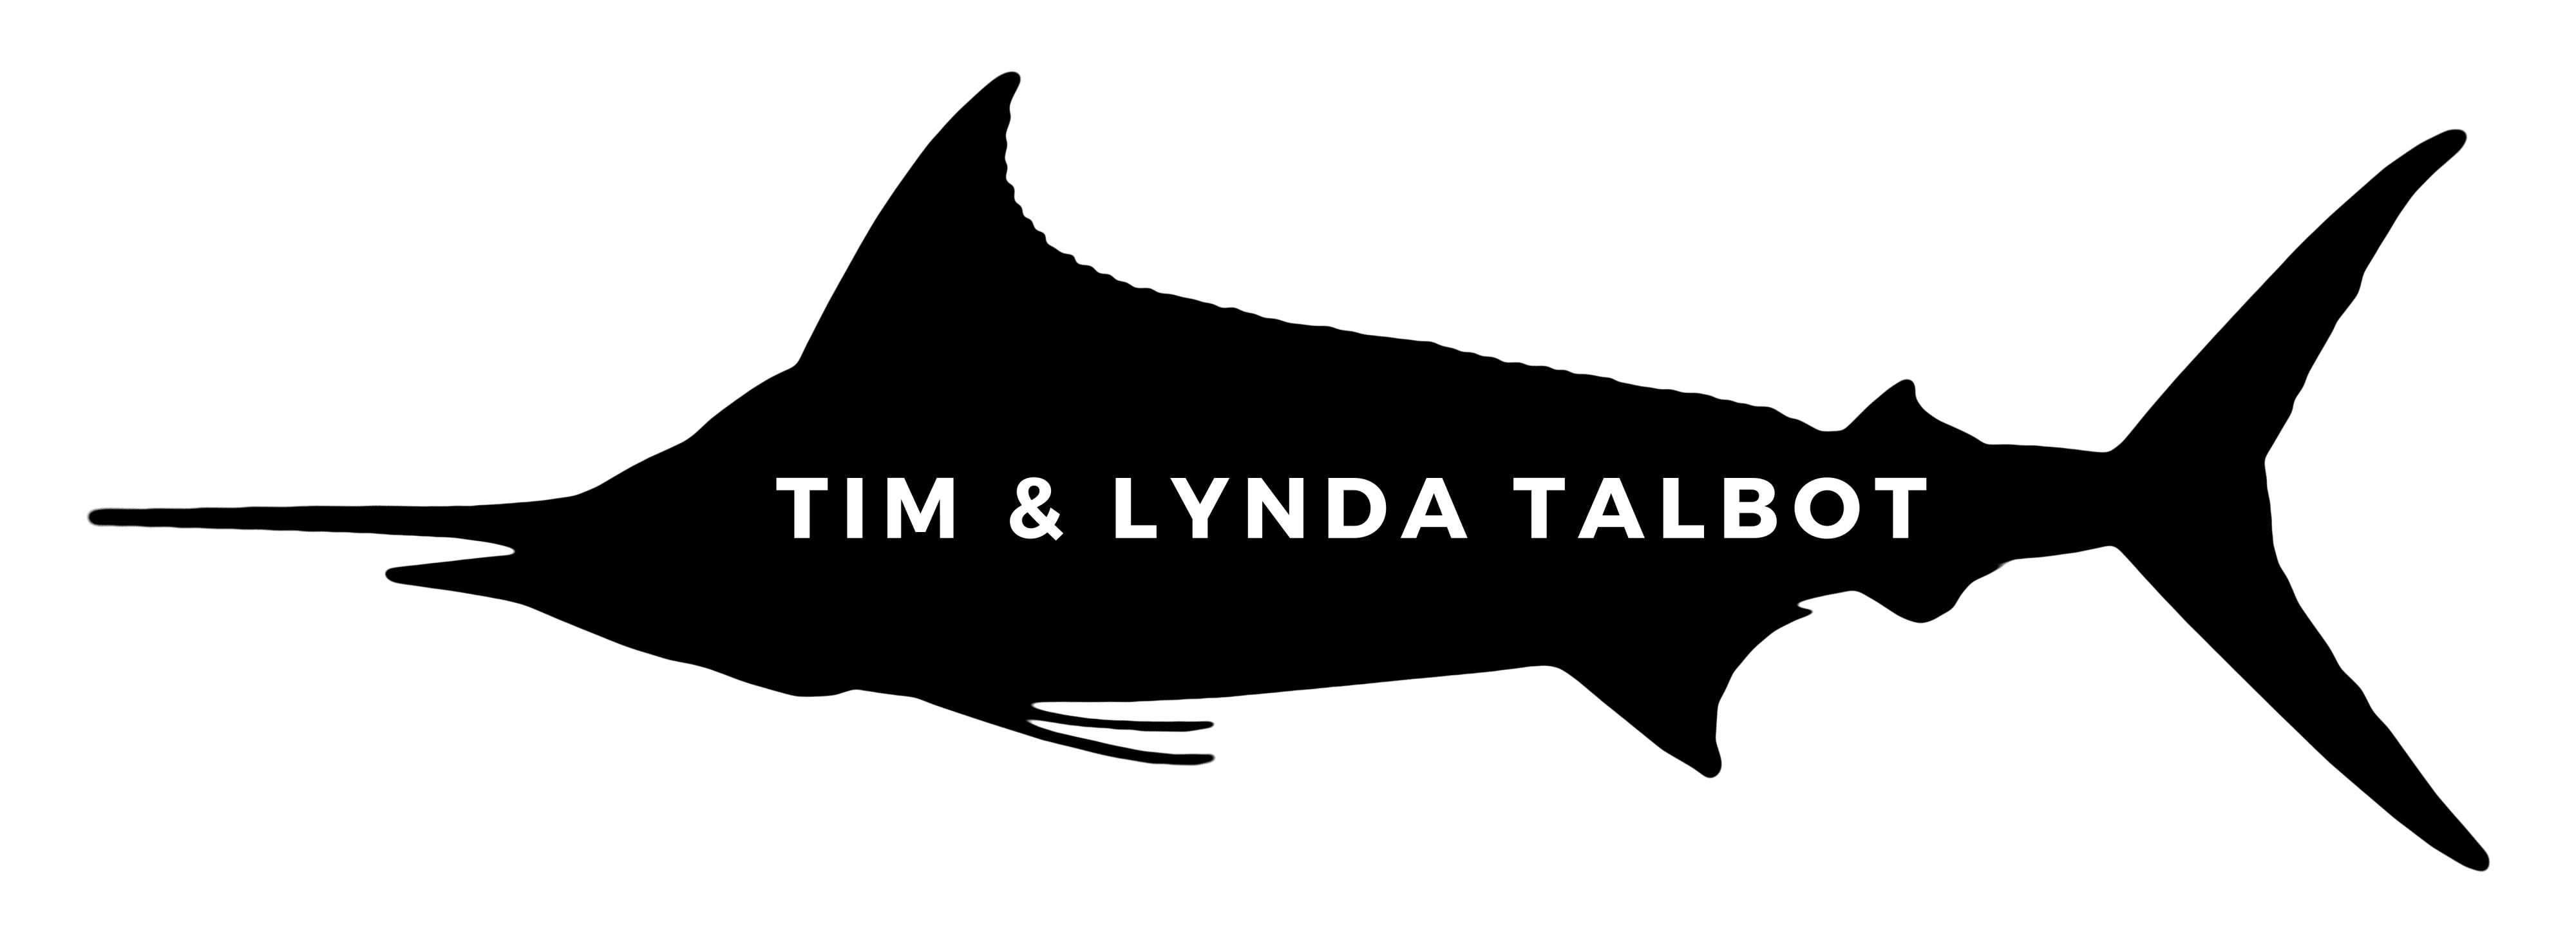 Broadbill Bash Sponsors Tim & Lynda Talbot